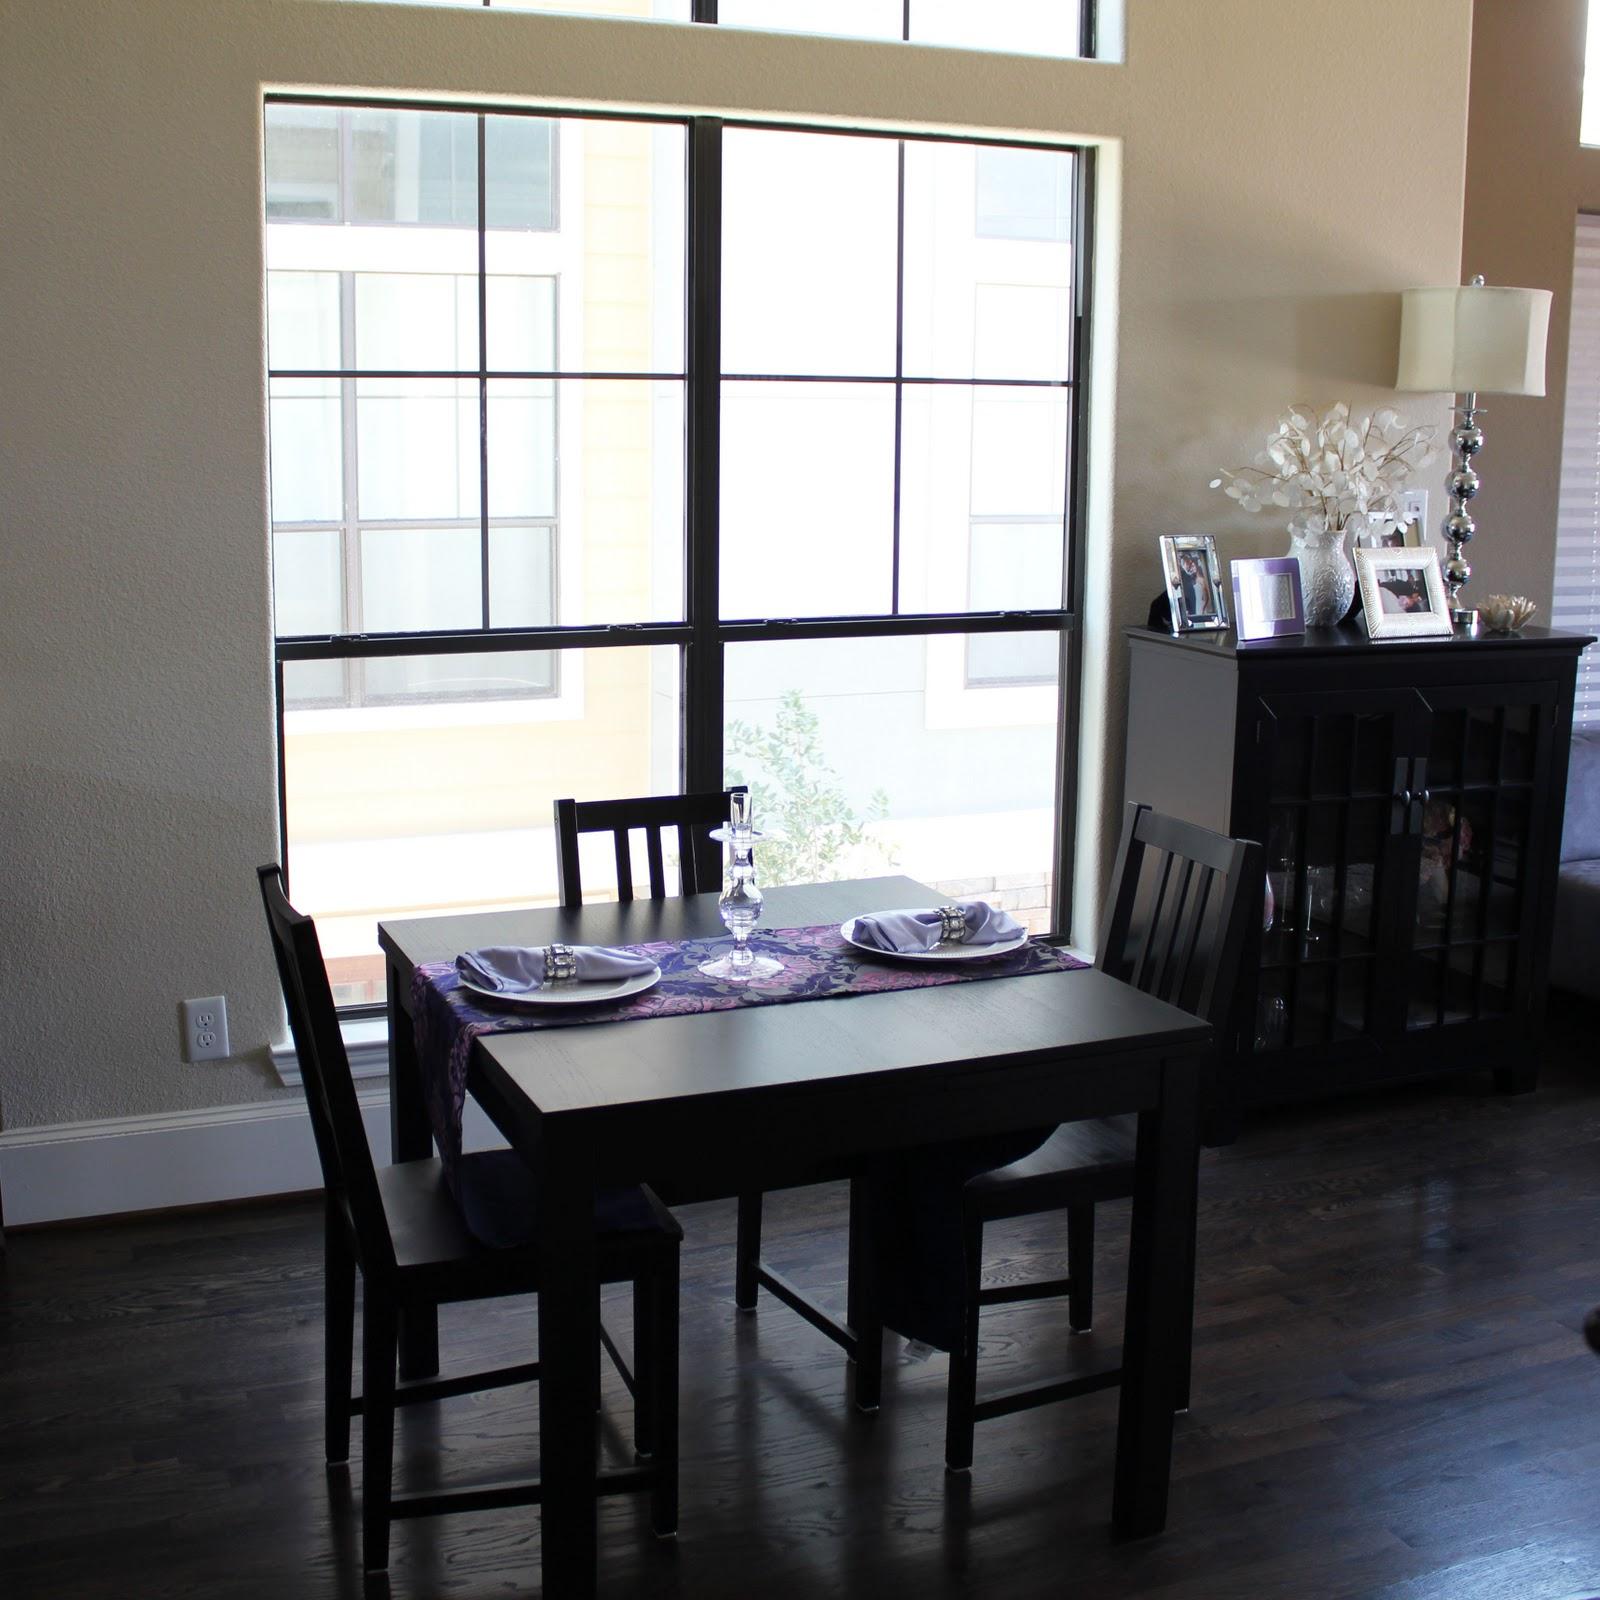 Home Tour: Updates W/ Furniture & Decor